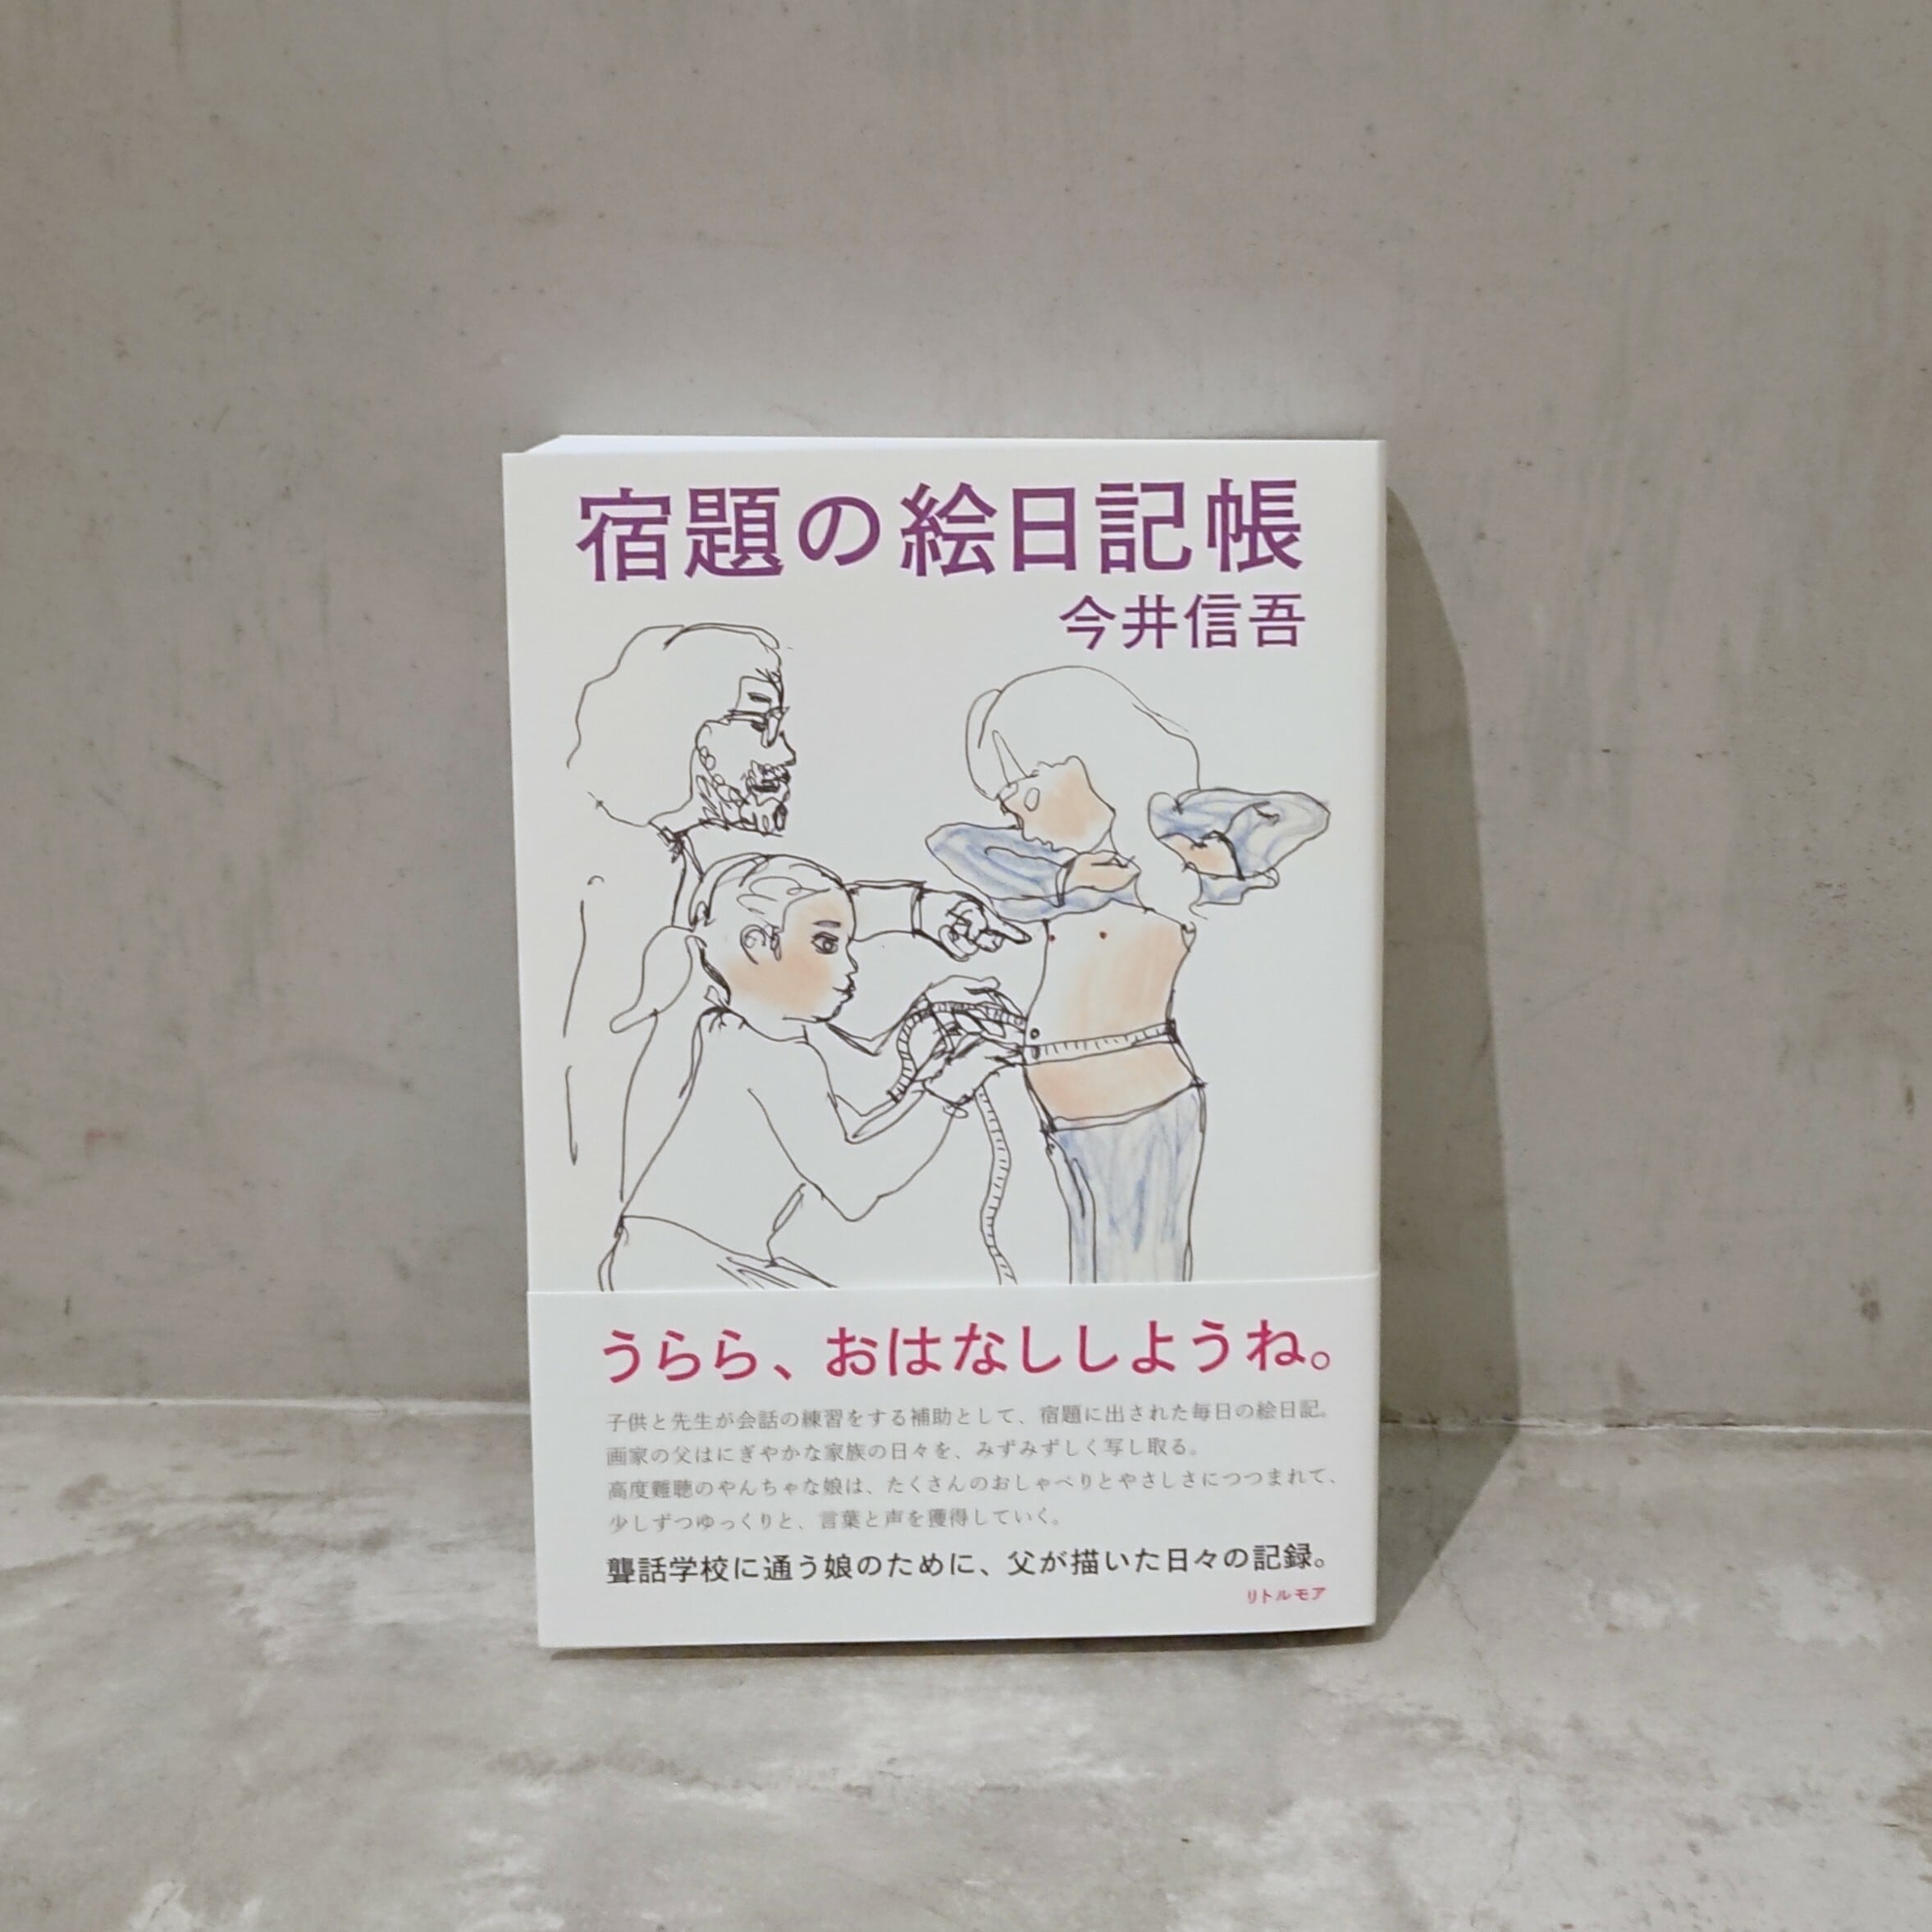 BOOK / 今井信吾『宿題の絵日記帳』